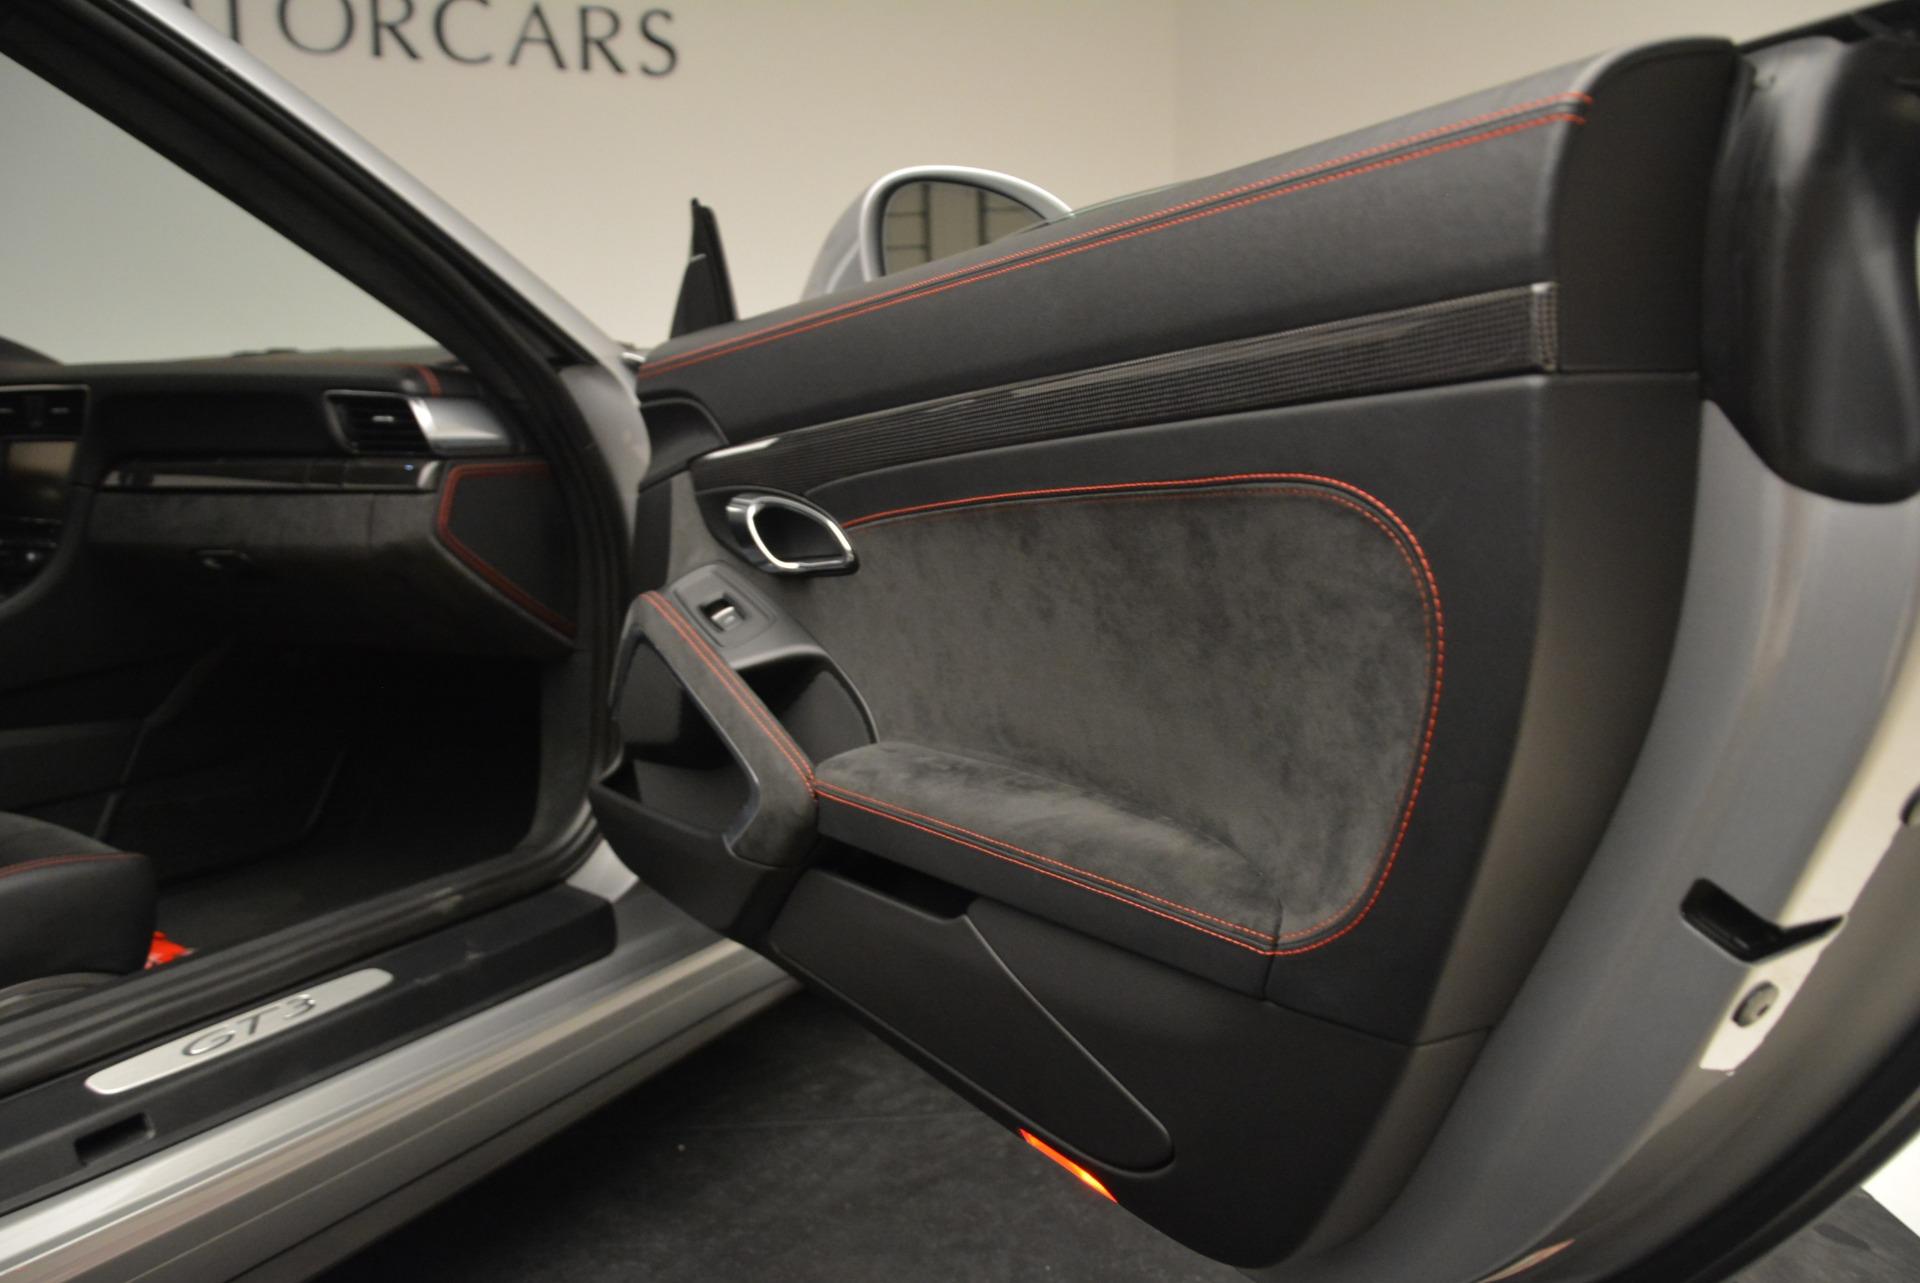 Used 2015 Porsche 911 GT3 For Sale In Greenwich, CT. Alfa Romeo of Greenwich, 4426A 2196_p30